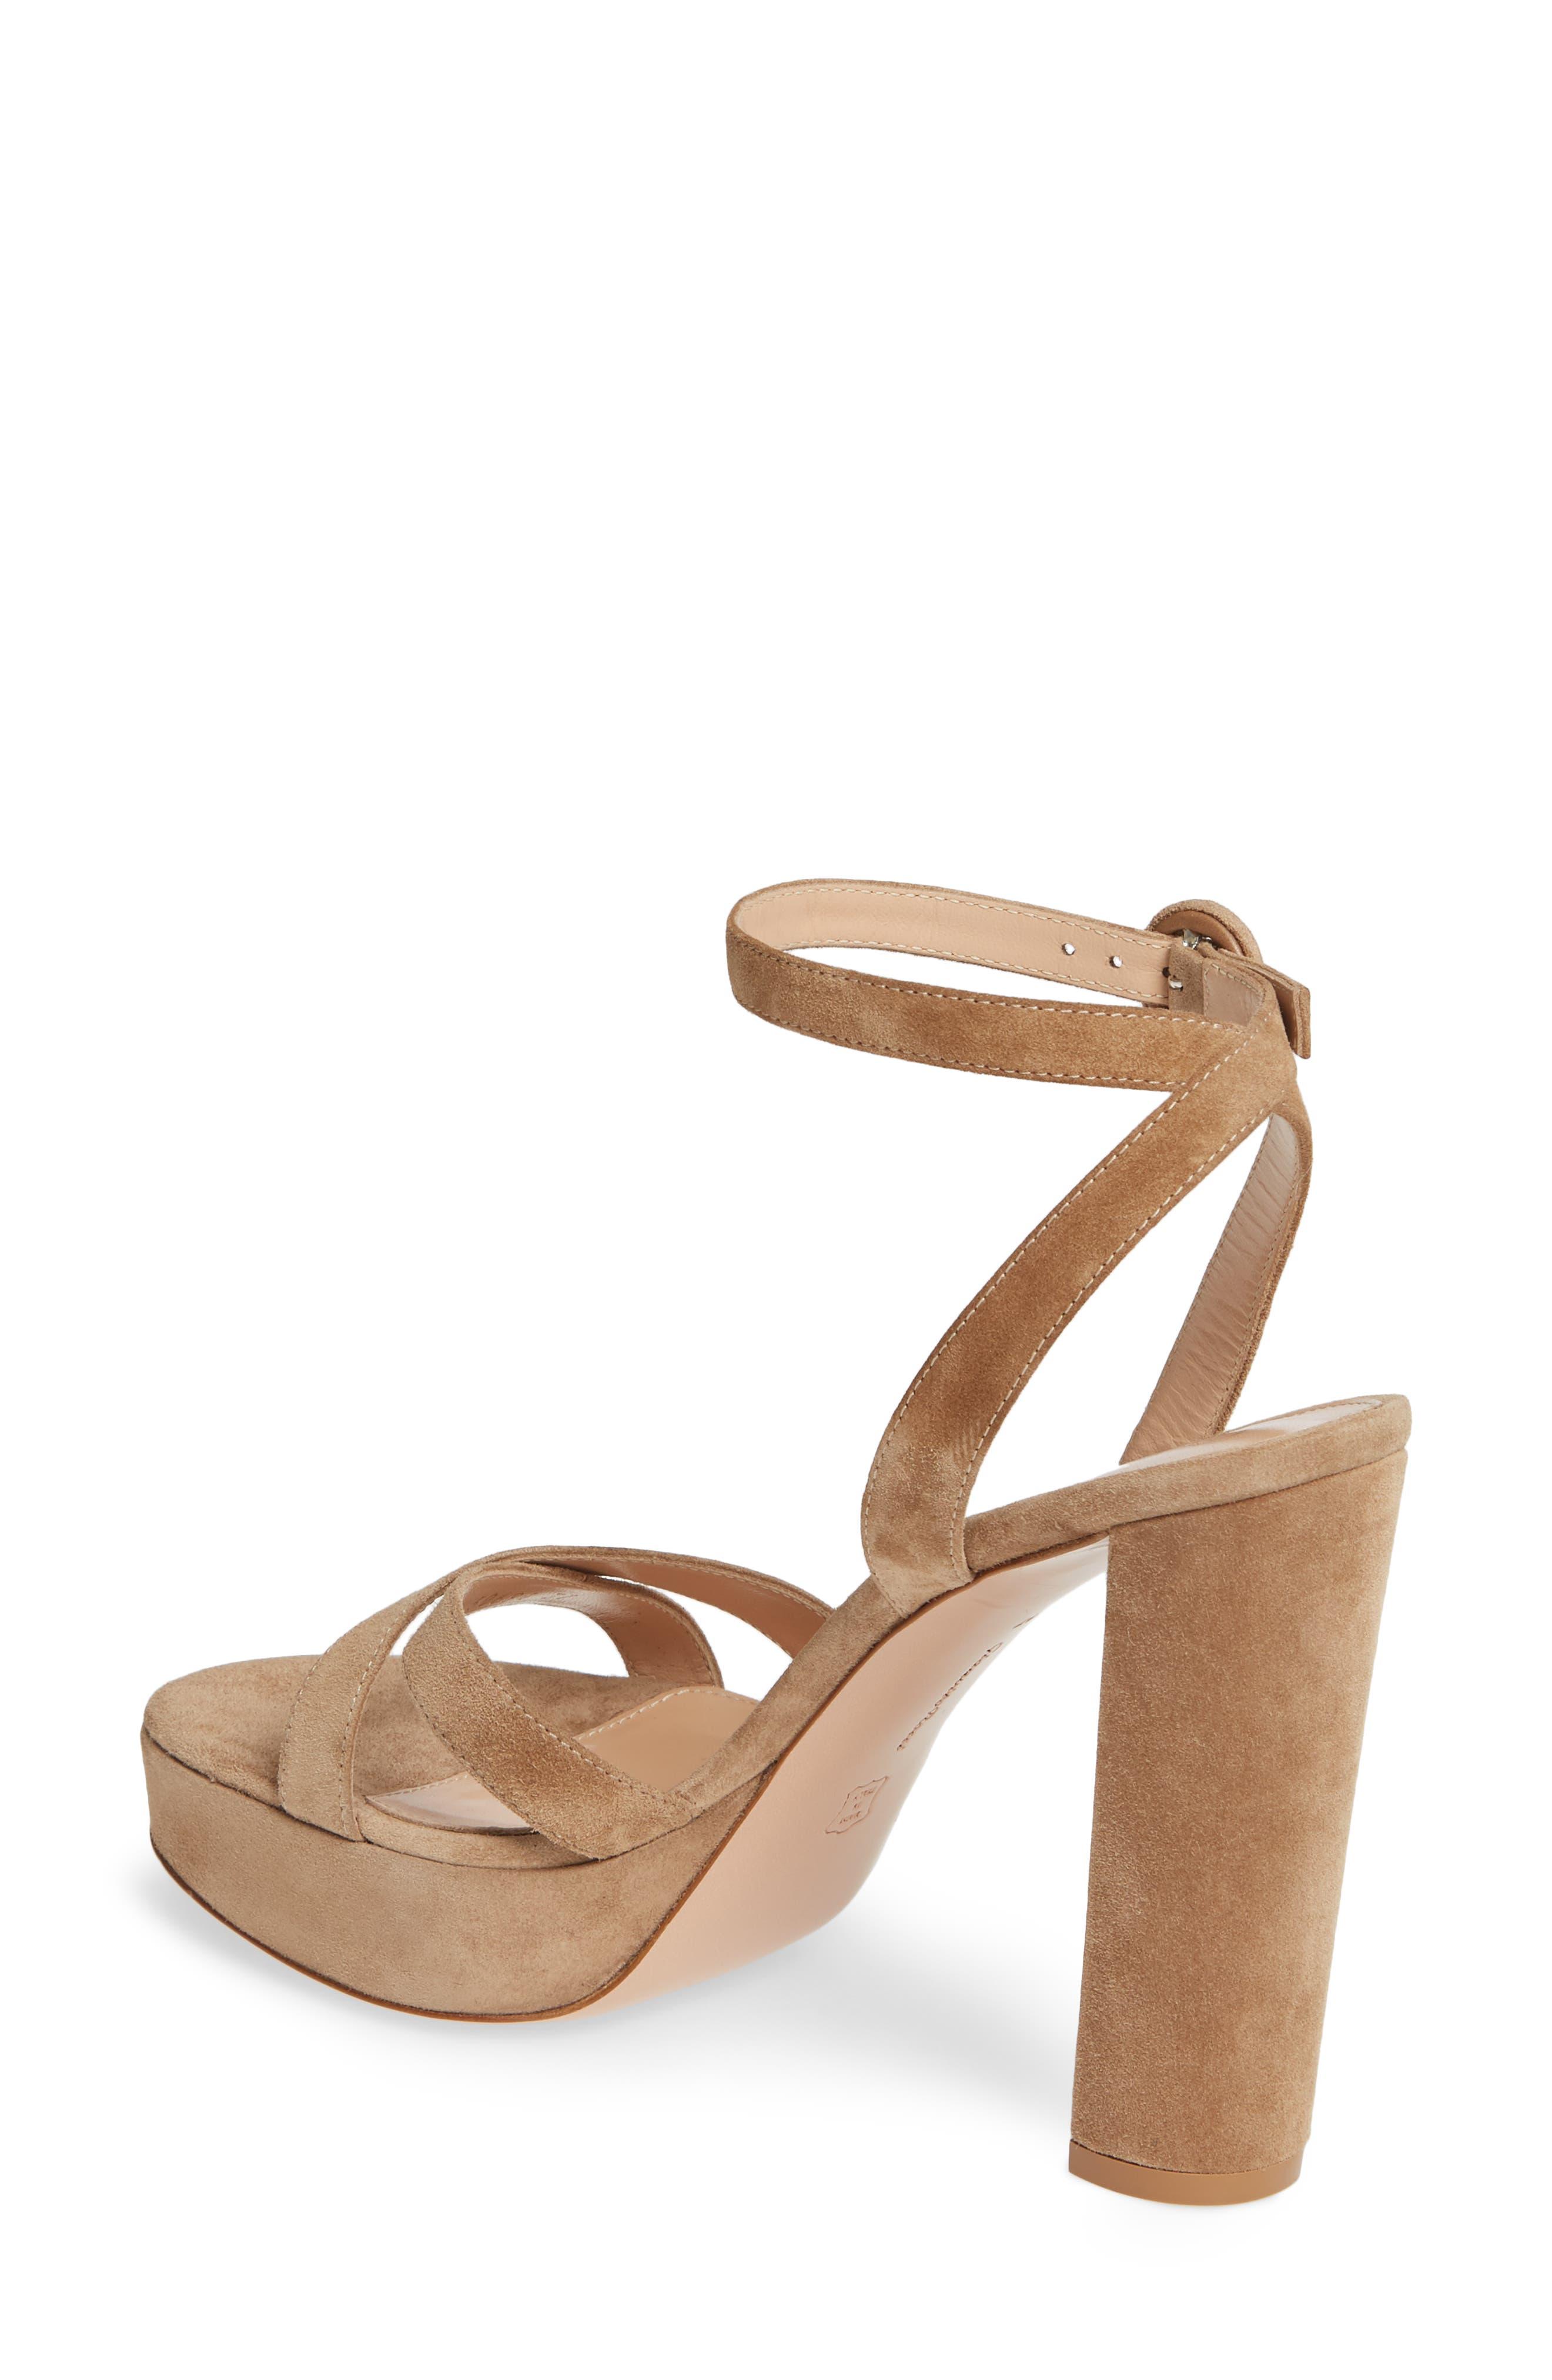 GIANVITO ROSSI, Ankle Strap Platform Sandal, Alternate thumbnail 2, color, CAMEL SUEDE